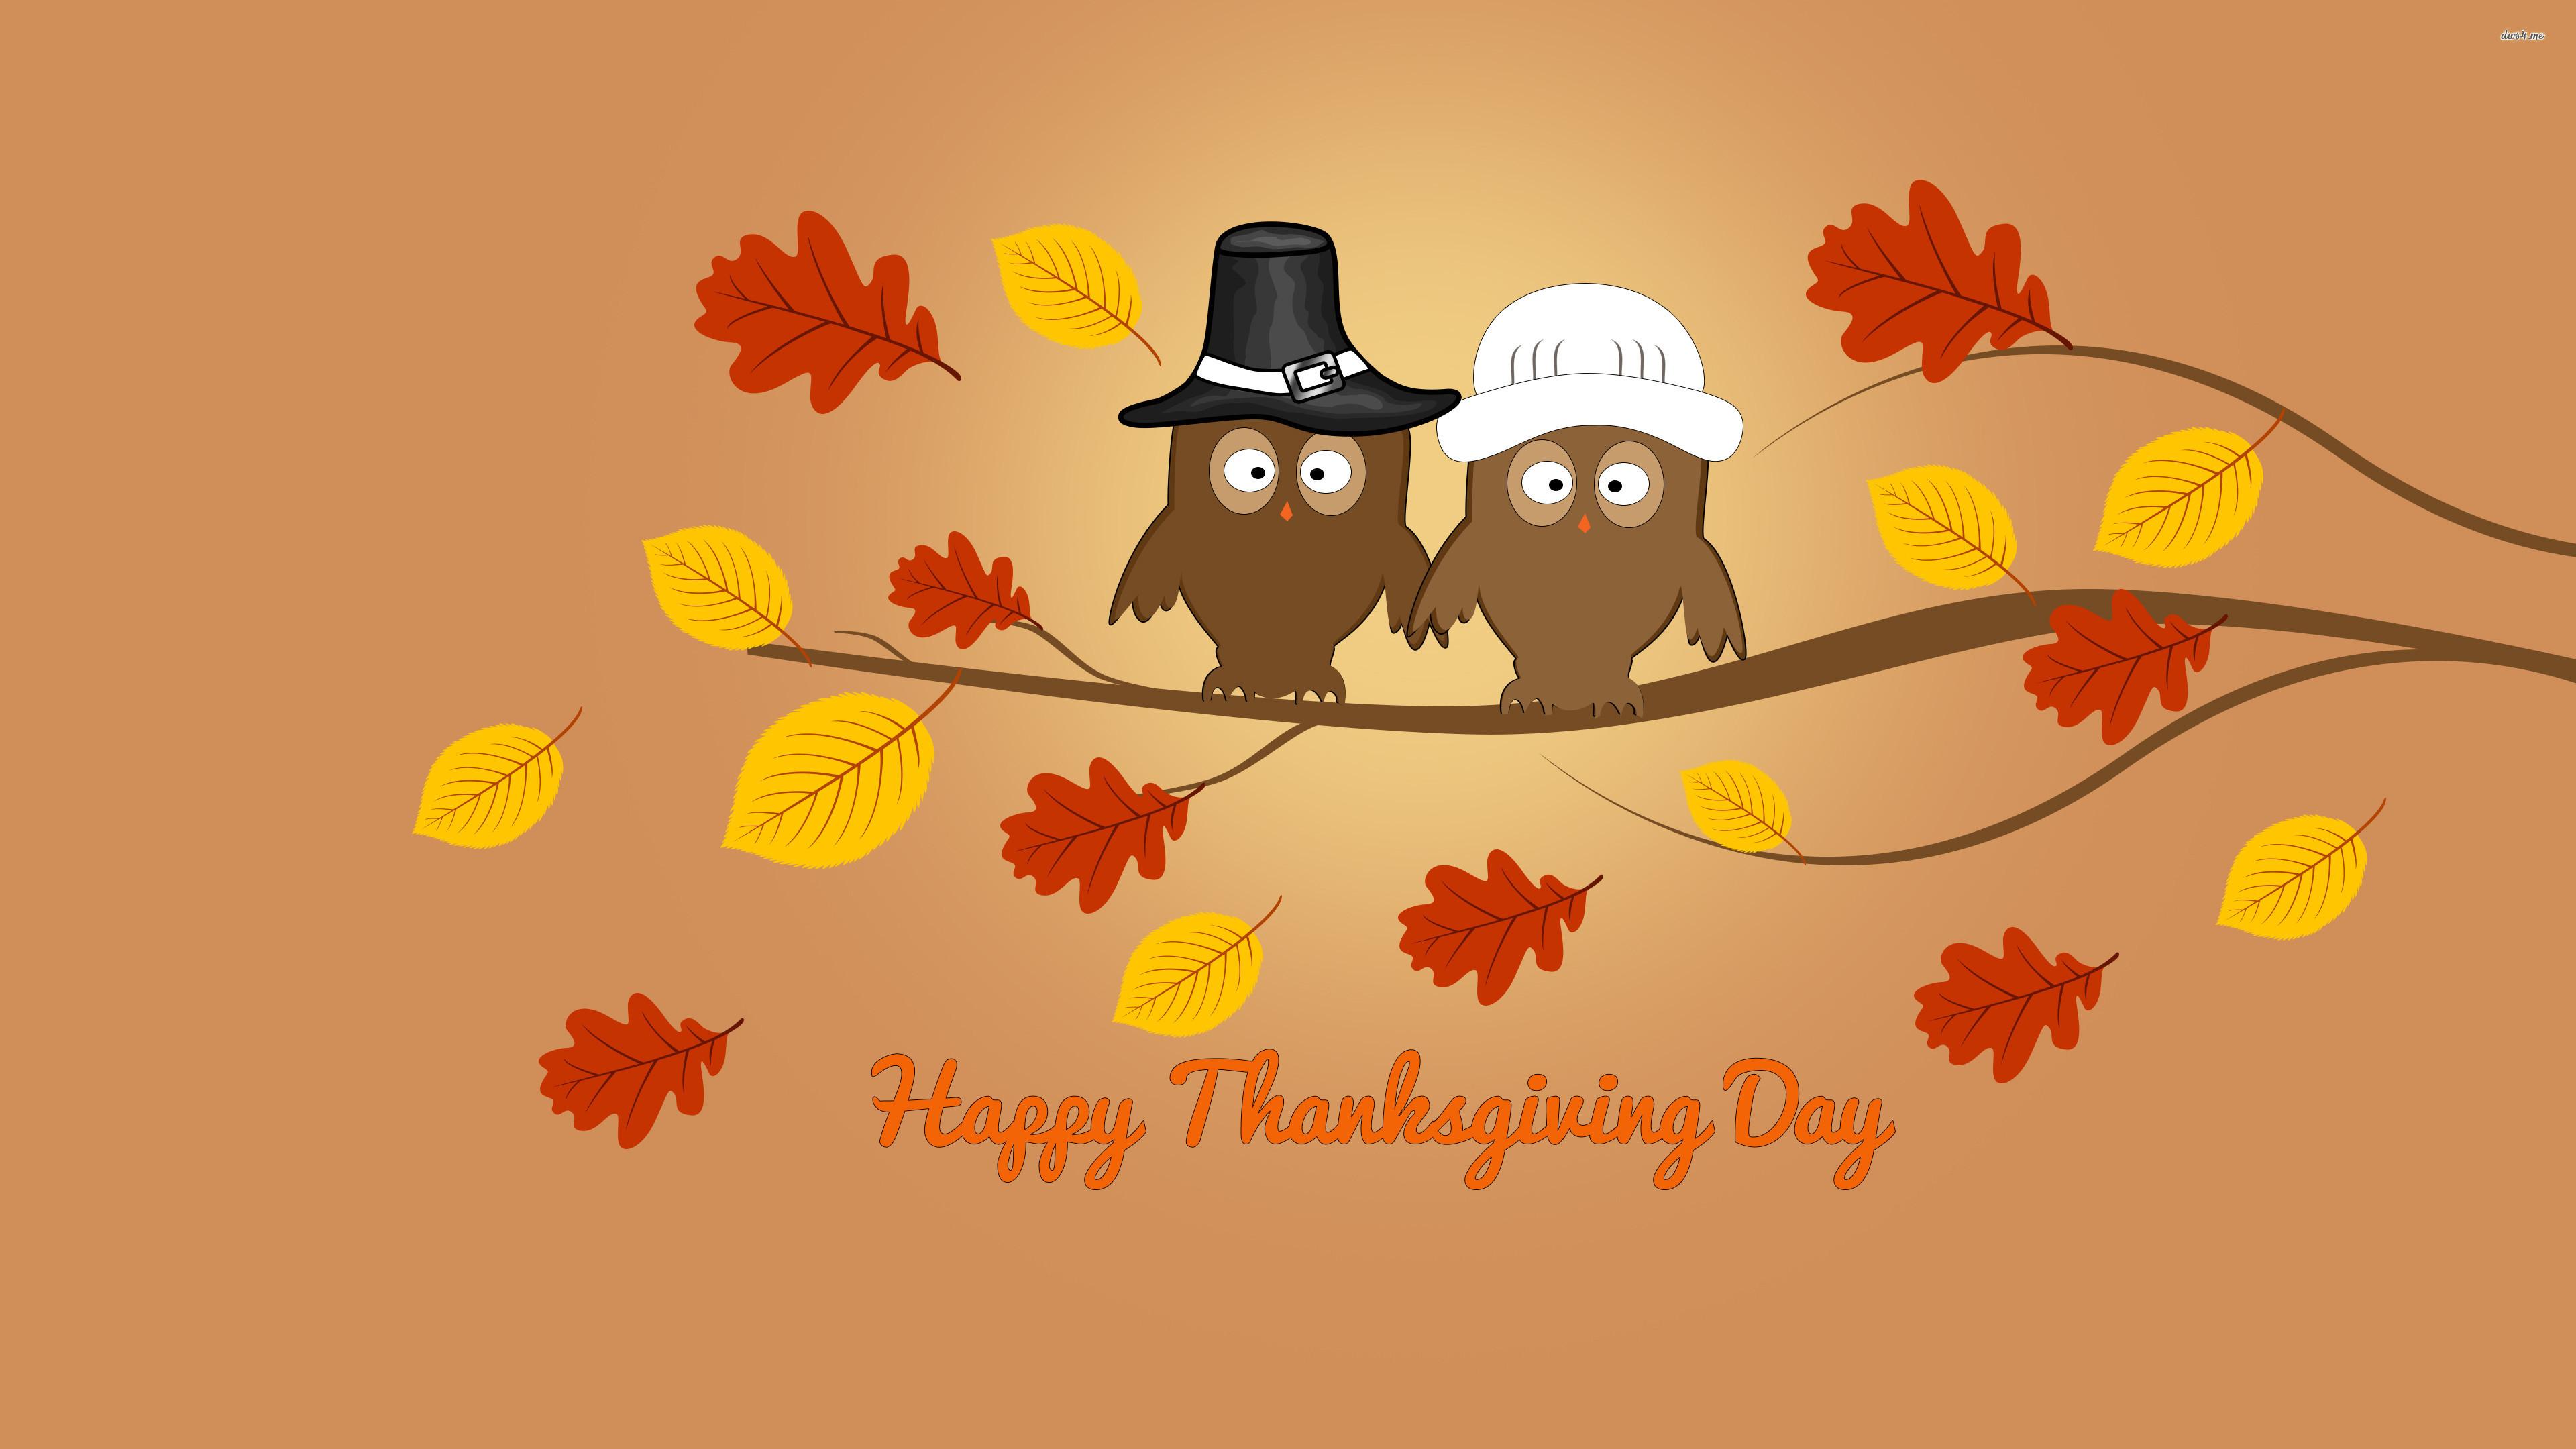 8th annual thanksgiving day - HD3840×2160